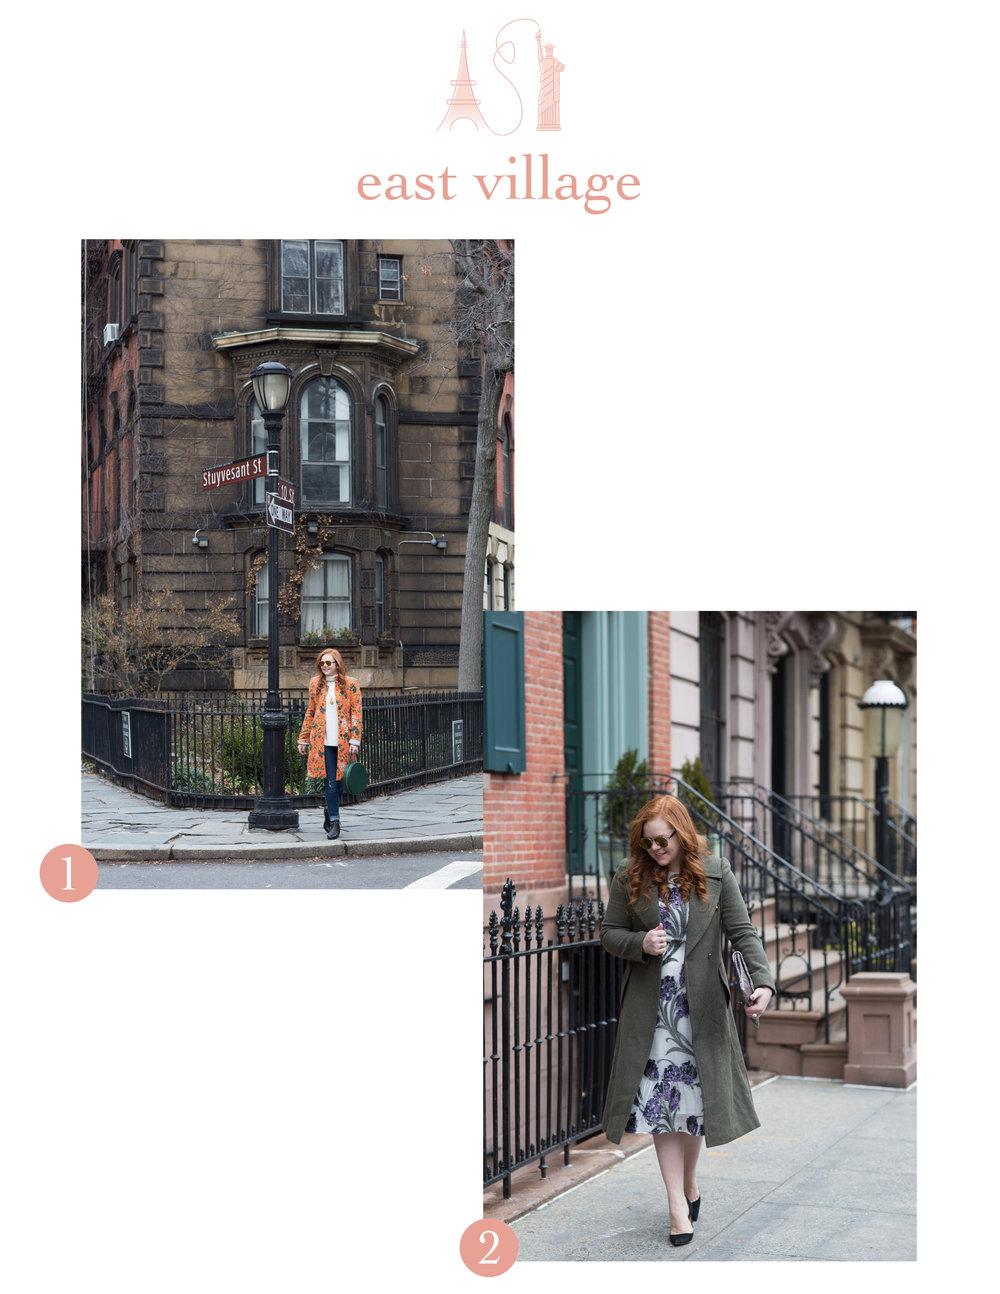 east_village_photo_locations.jpg